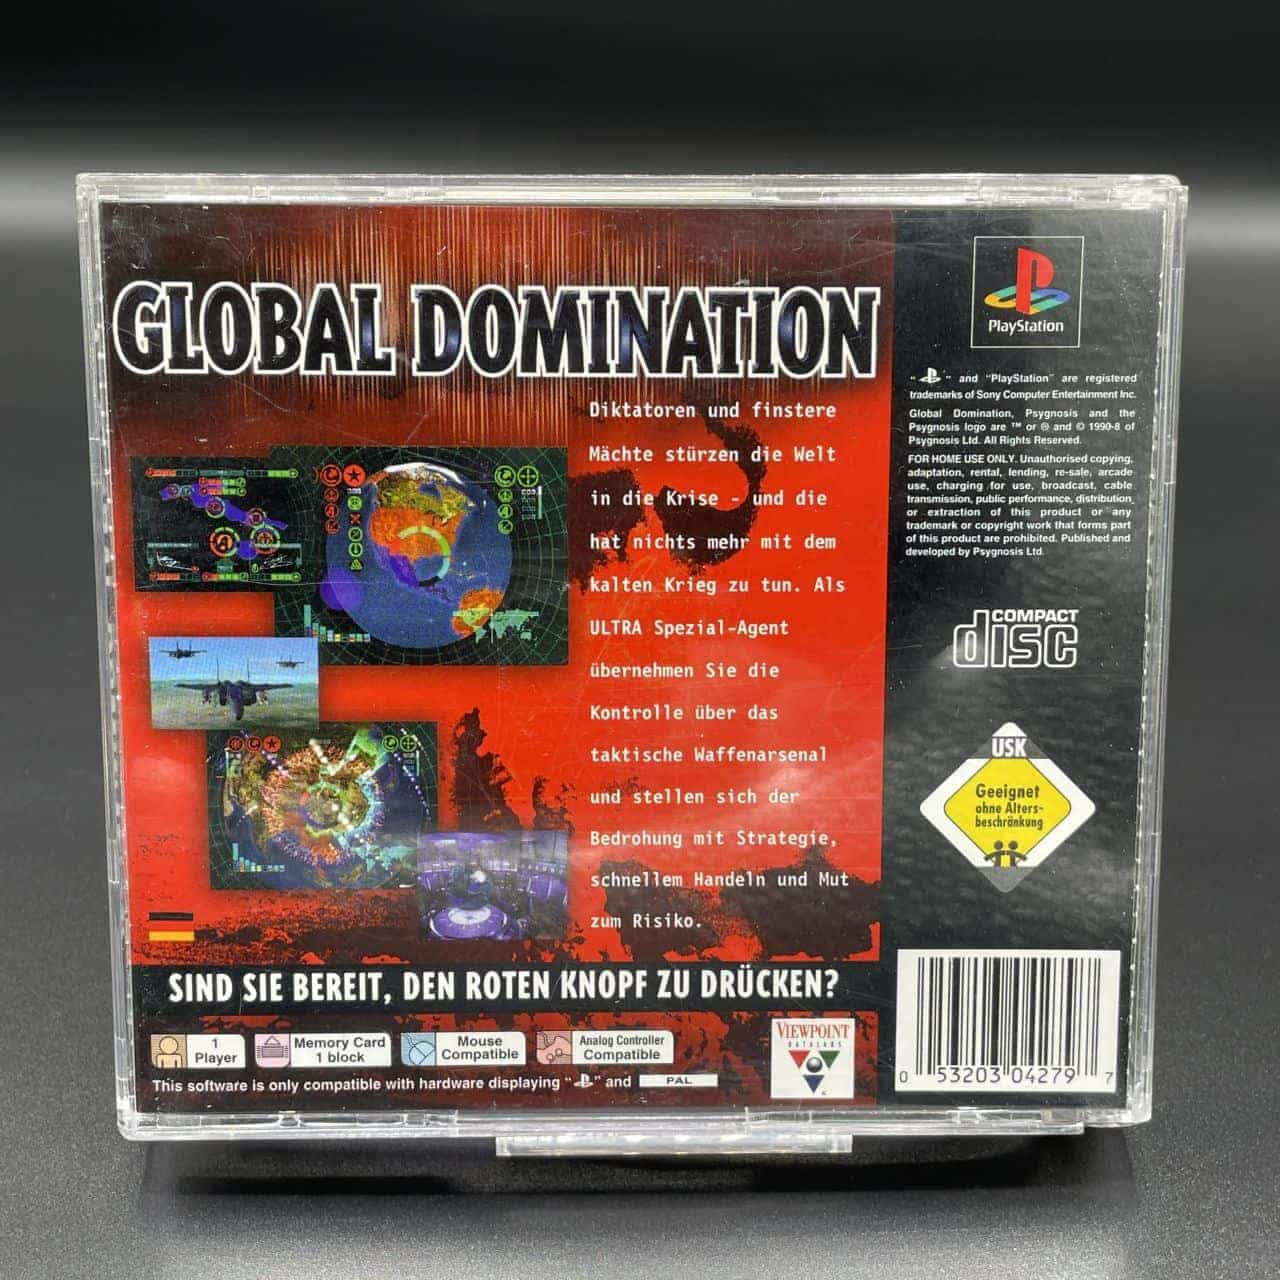 PS1 Global Domination (Komplett) (Sehr gut) Sony PlayStation 1